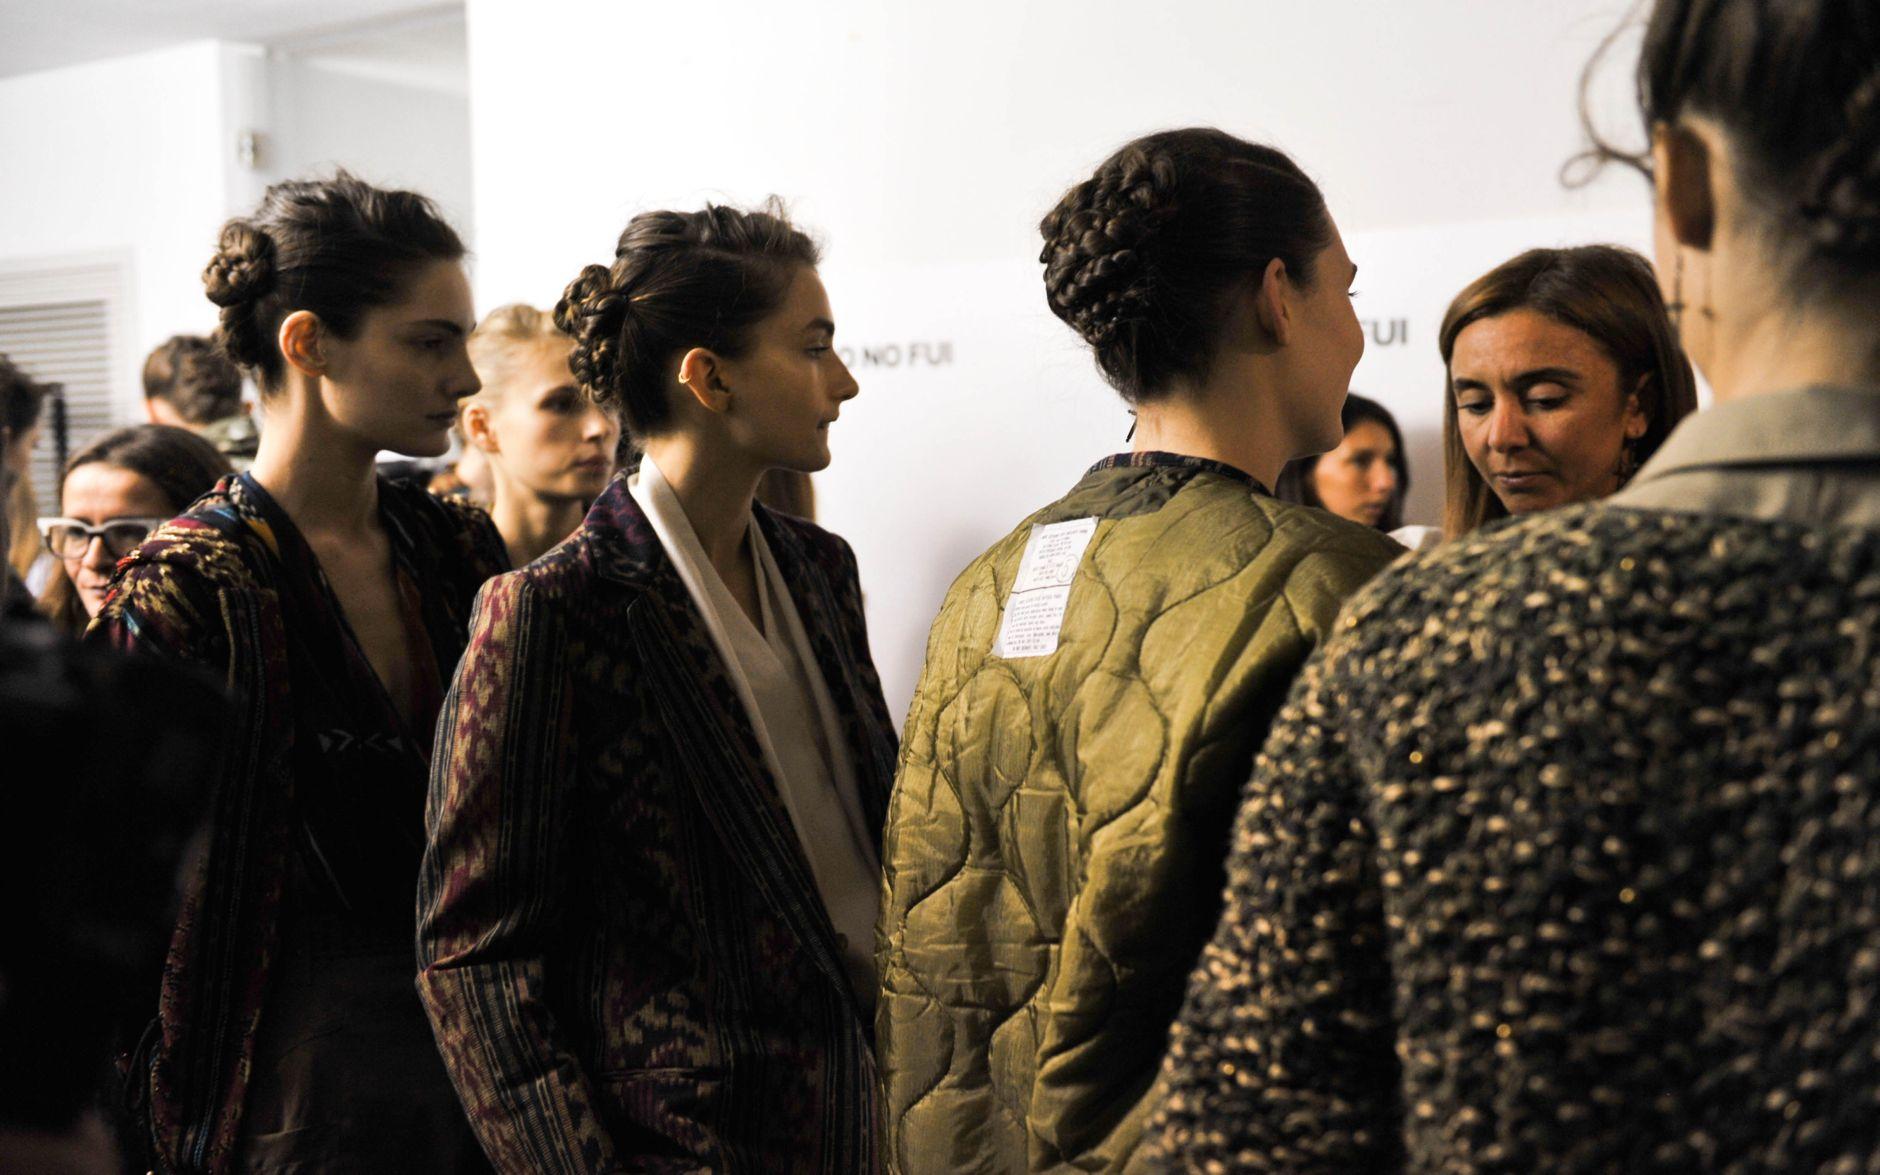 Jo No Fui Backstage Spring 2013 Milano Fashion Week